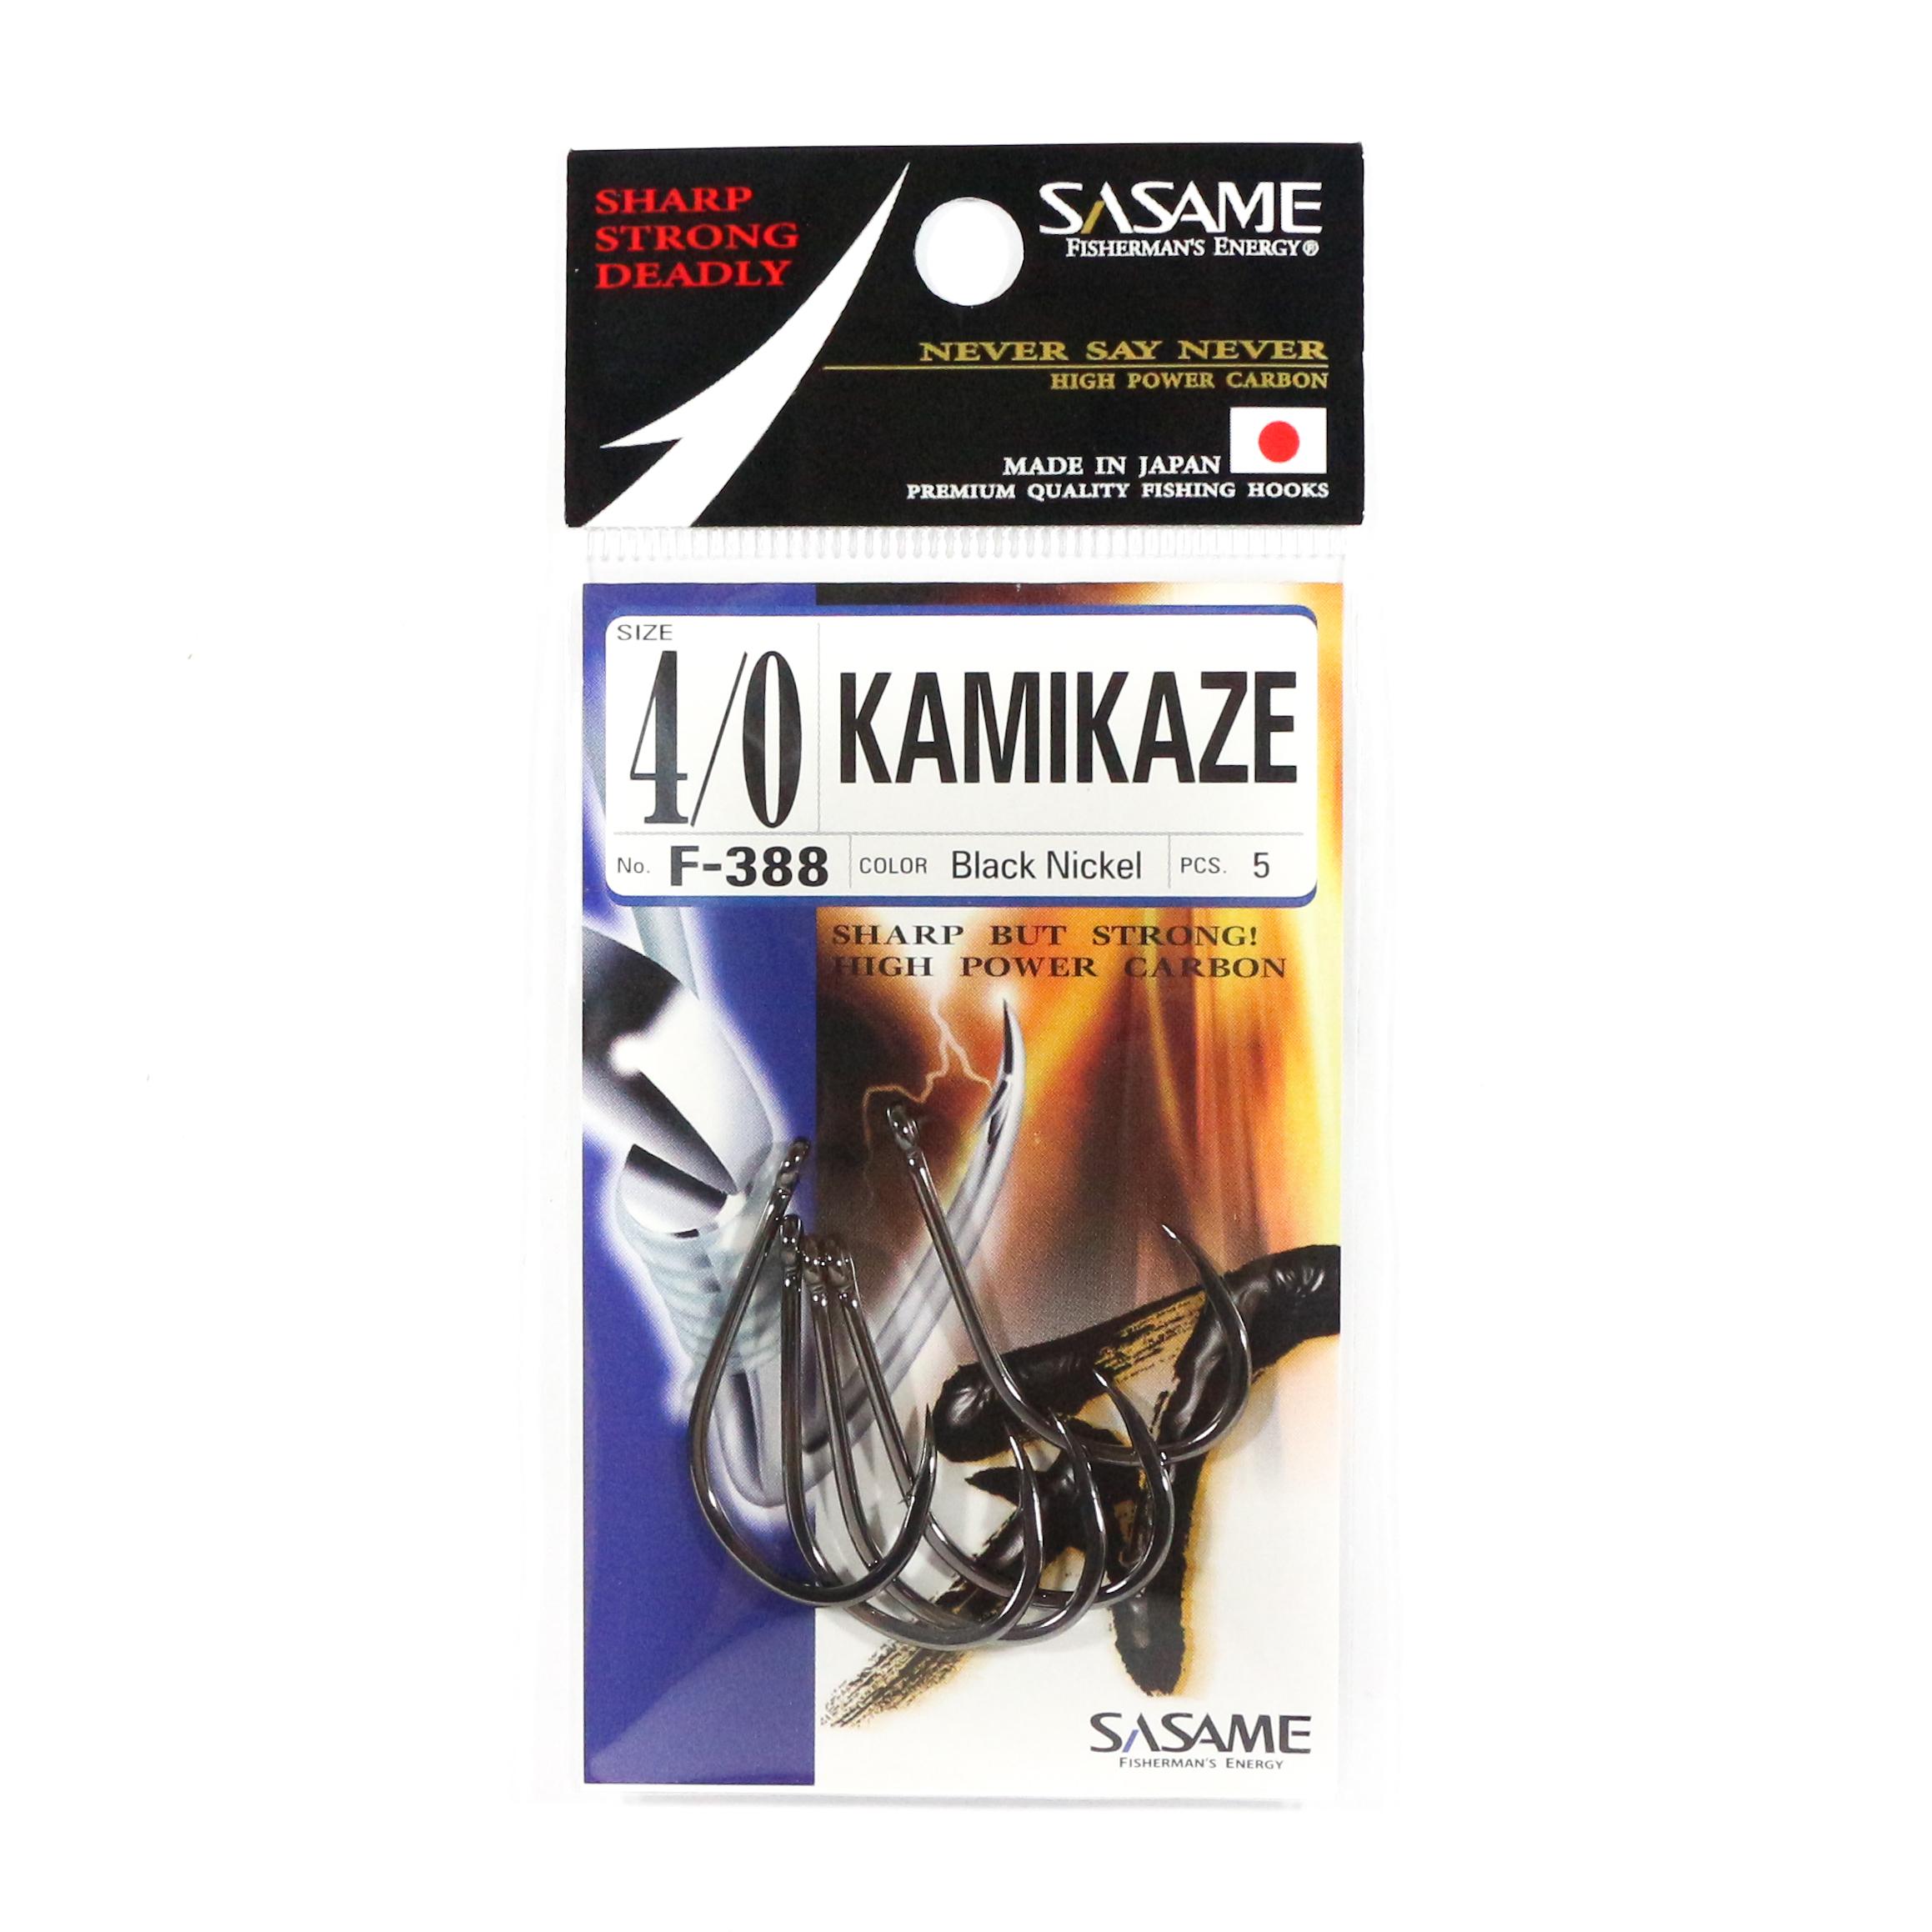 Sasame F-388 Kamikaze Straight Shank Offset Hook Size 4/0 (4842)